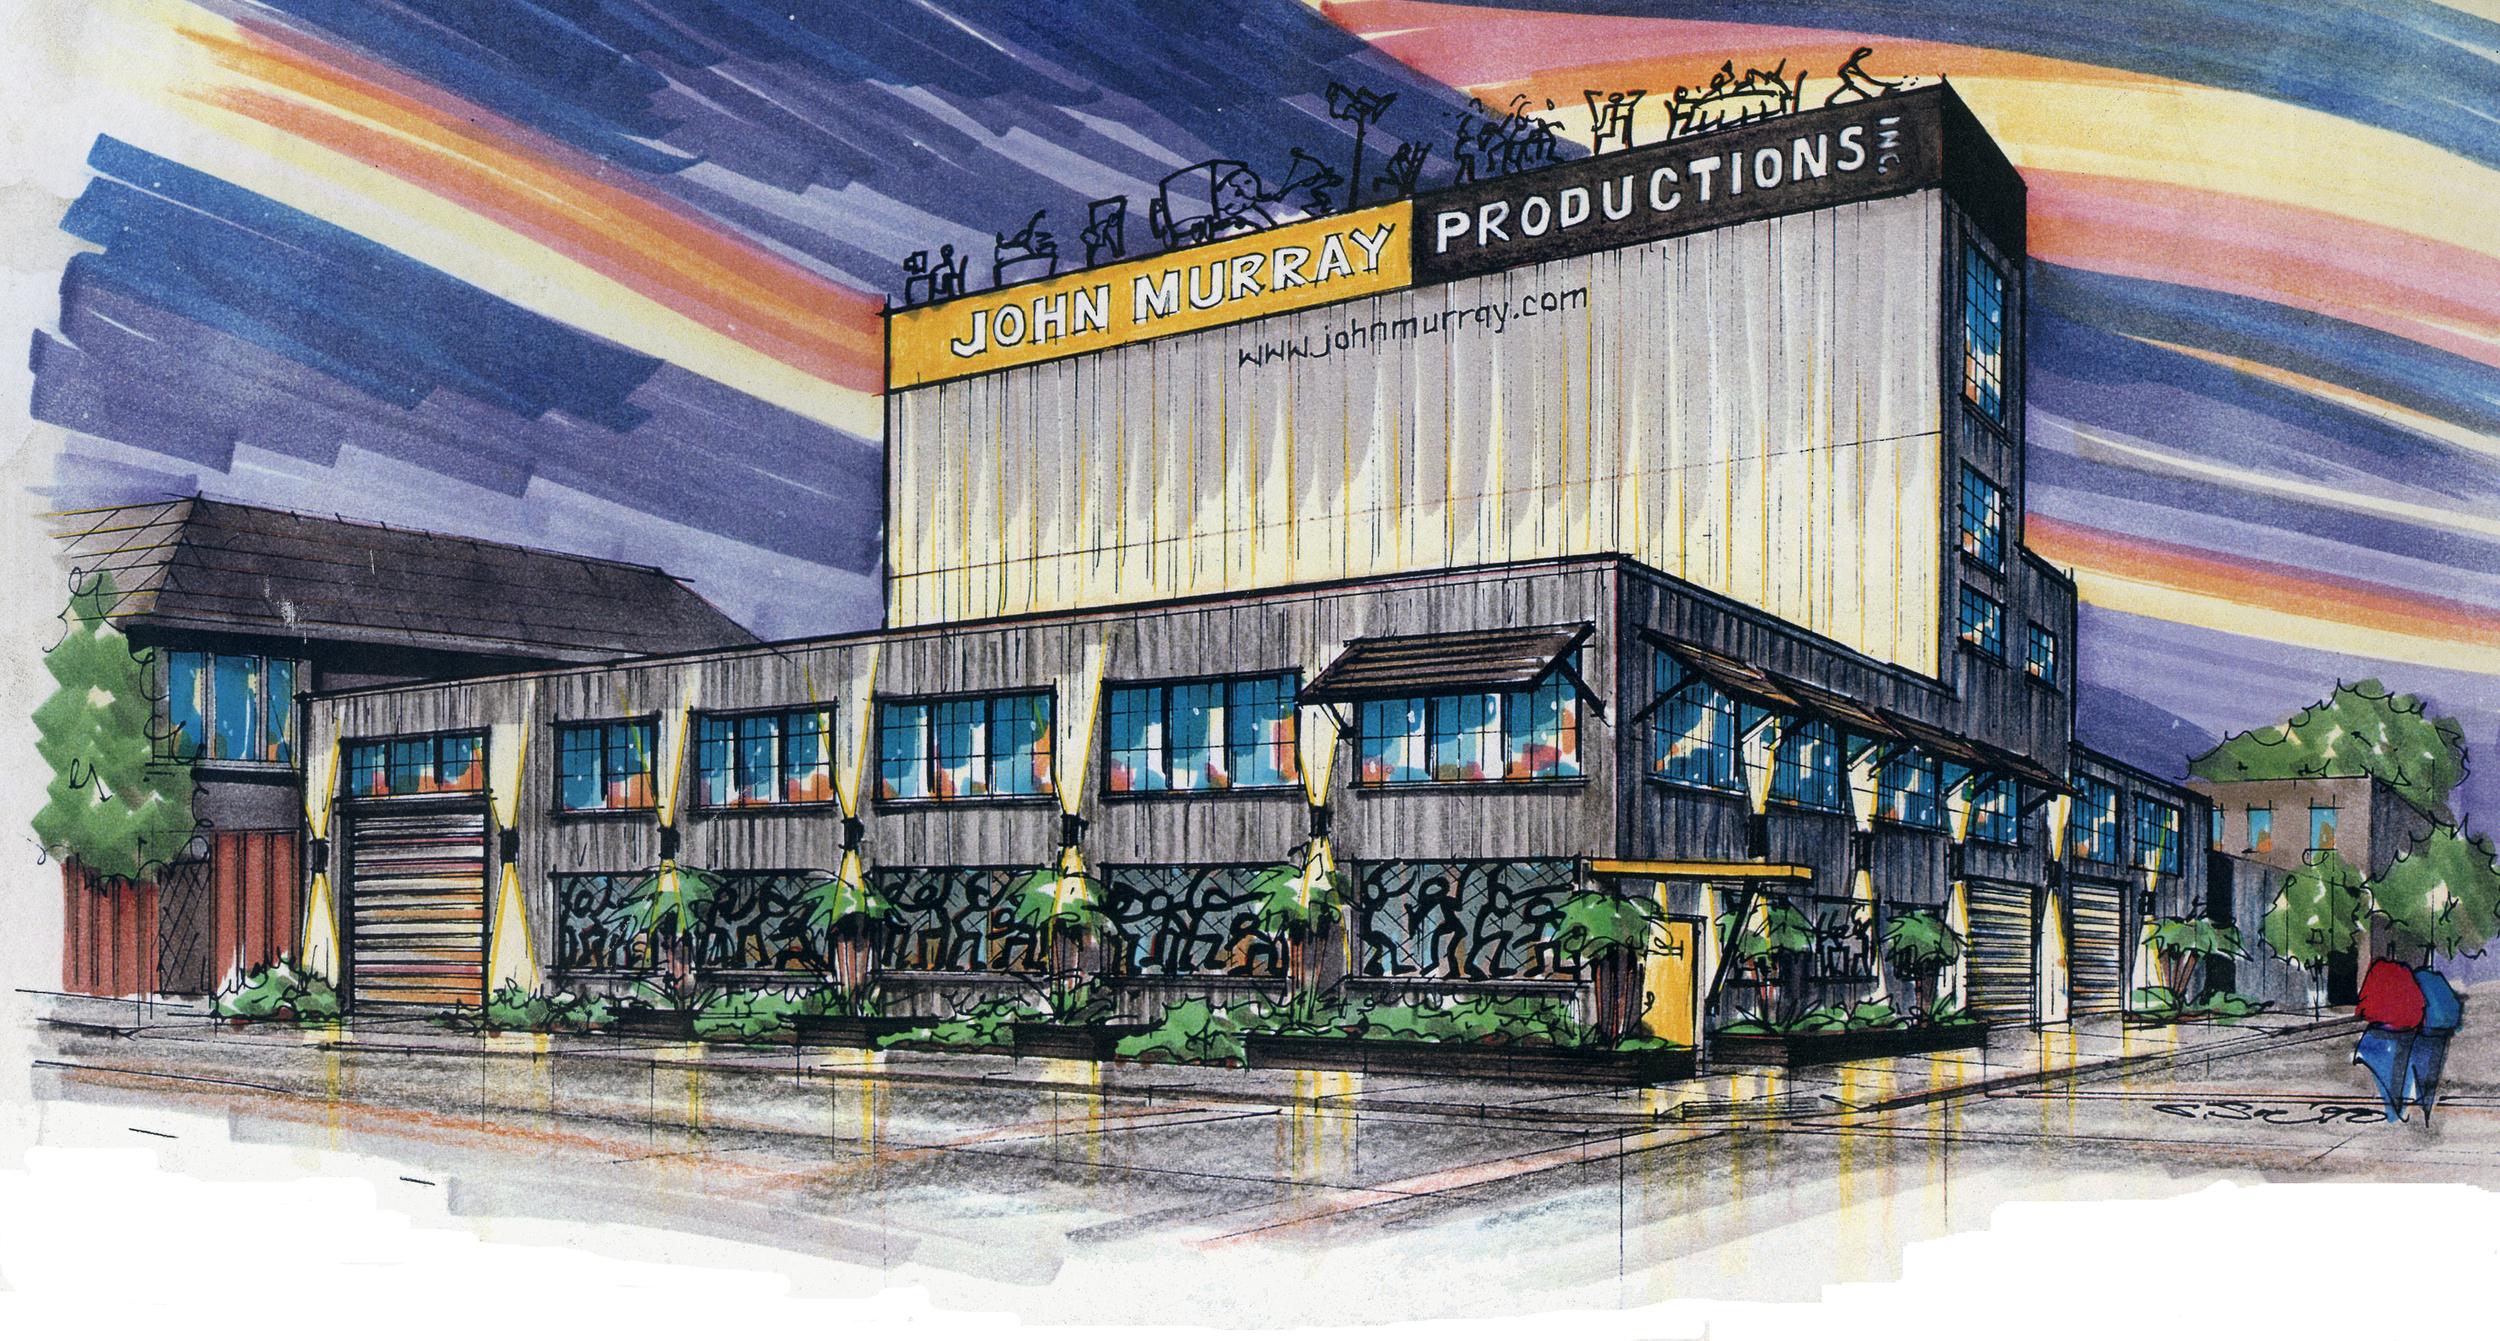 JohnMurrayProductions Building.jpg